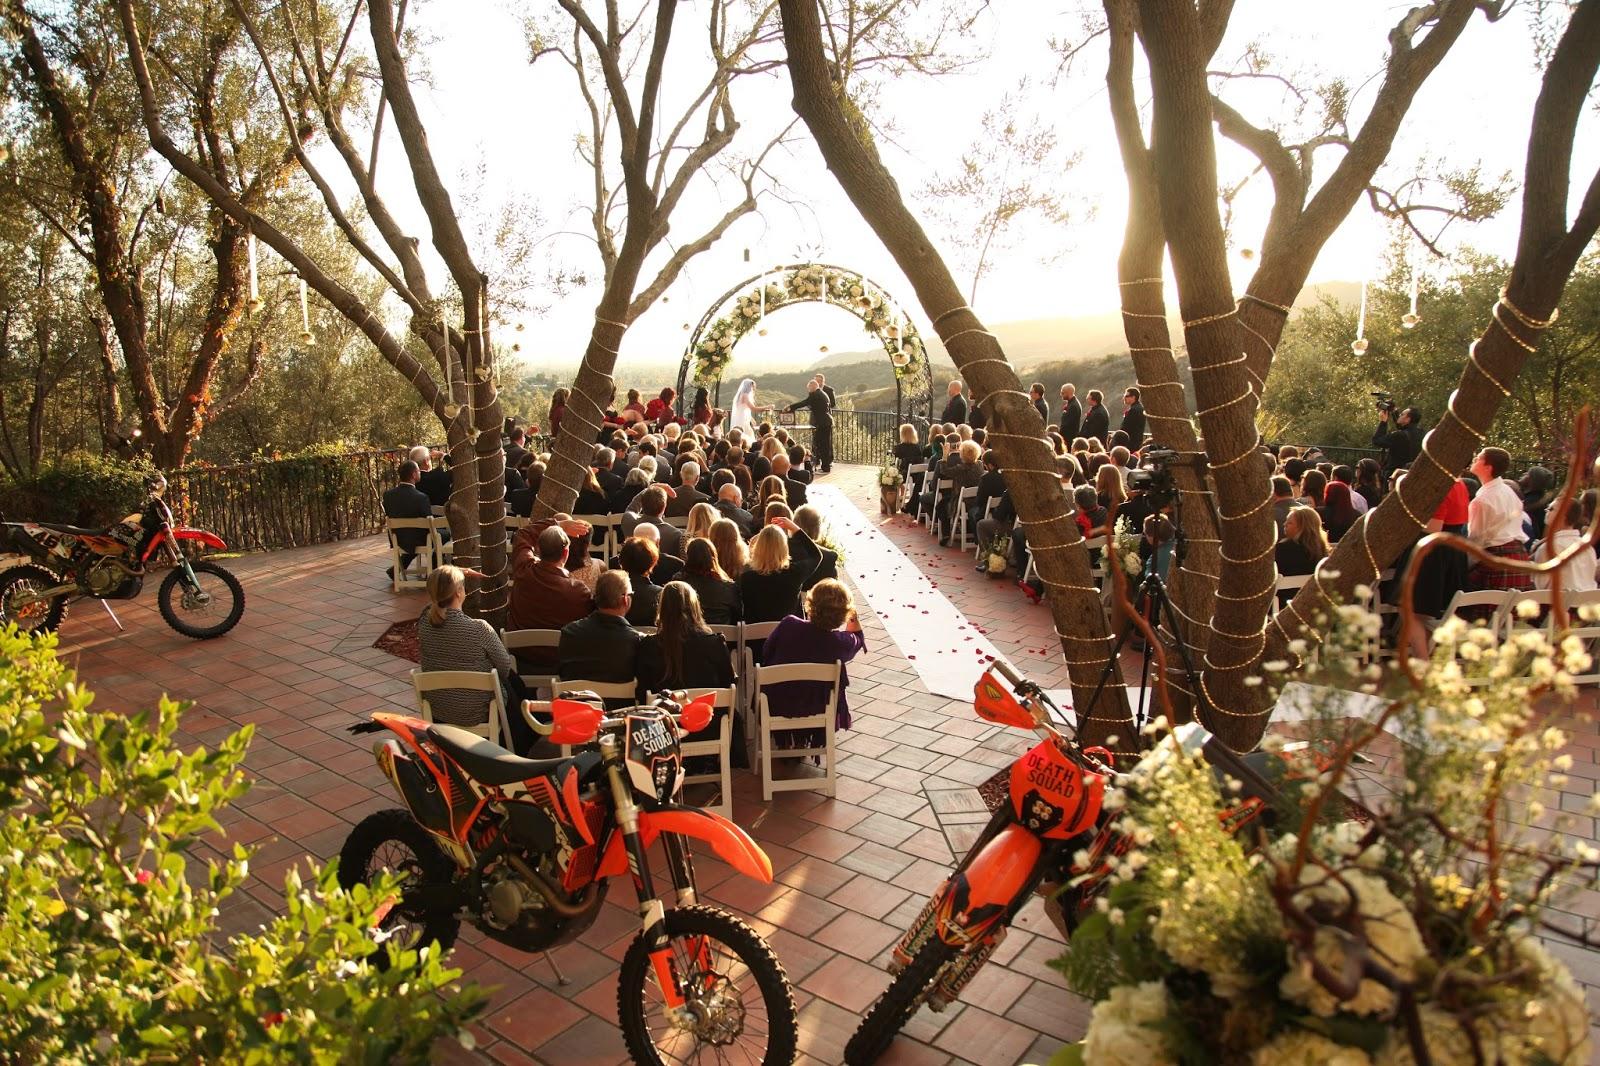 Dirt bike ceremony